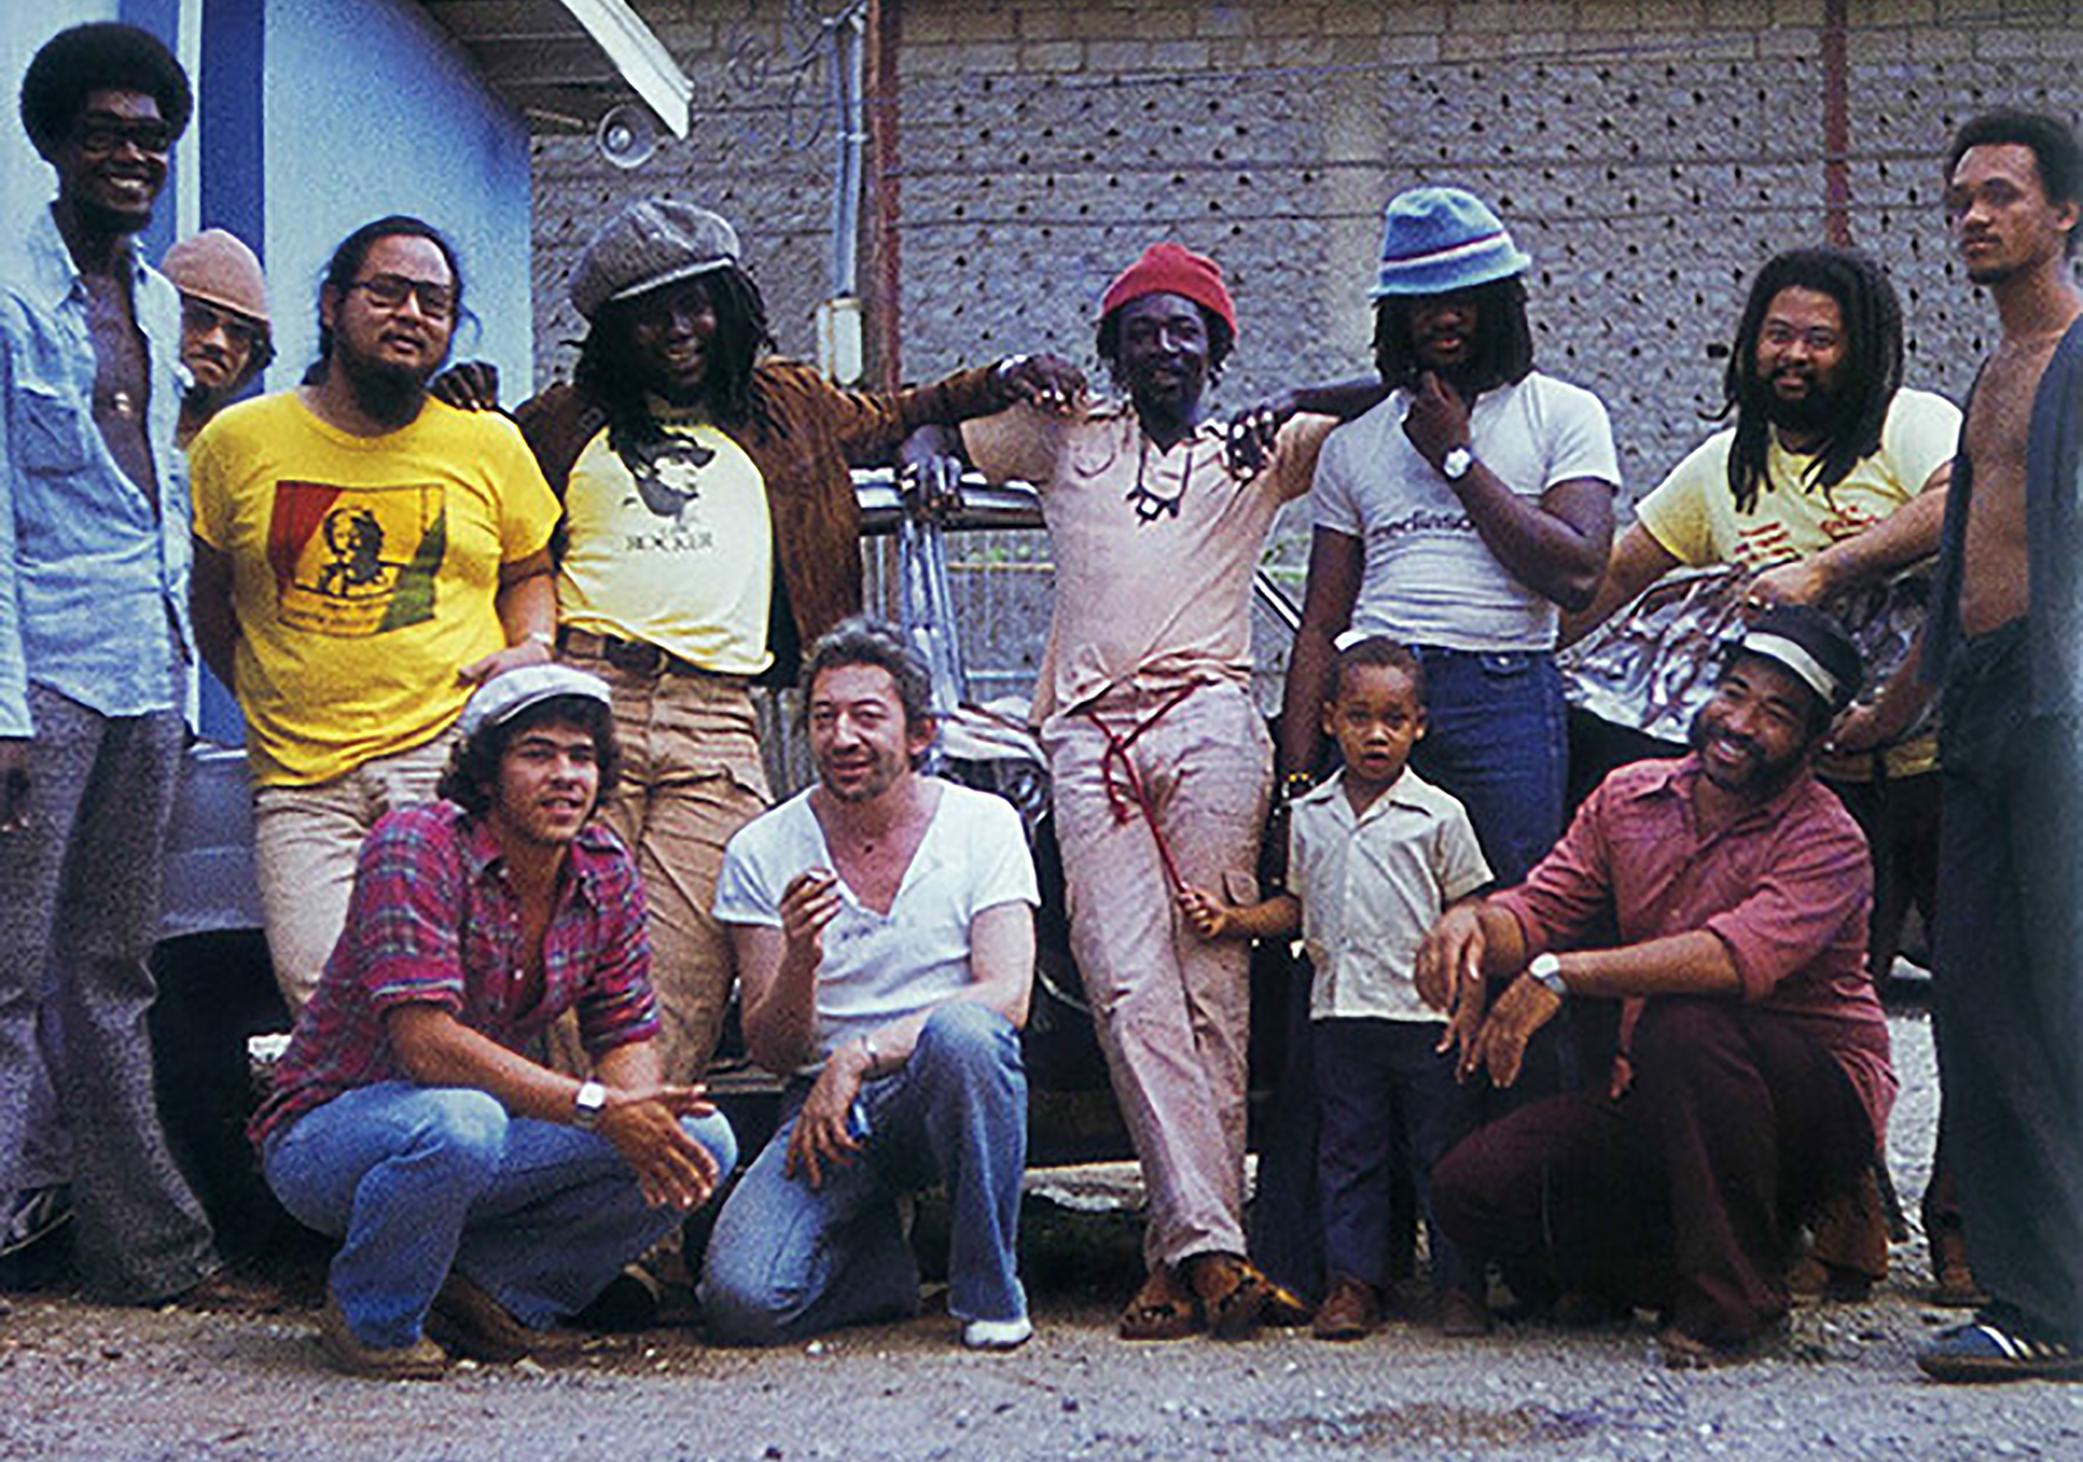 Gainsbourg et cætera : ses années reggae